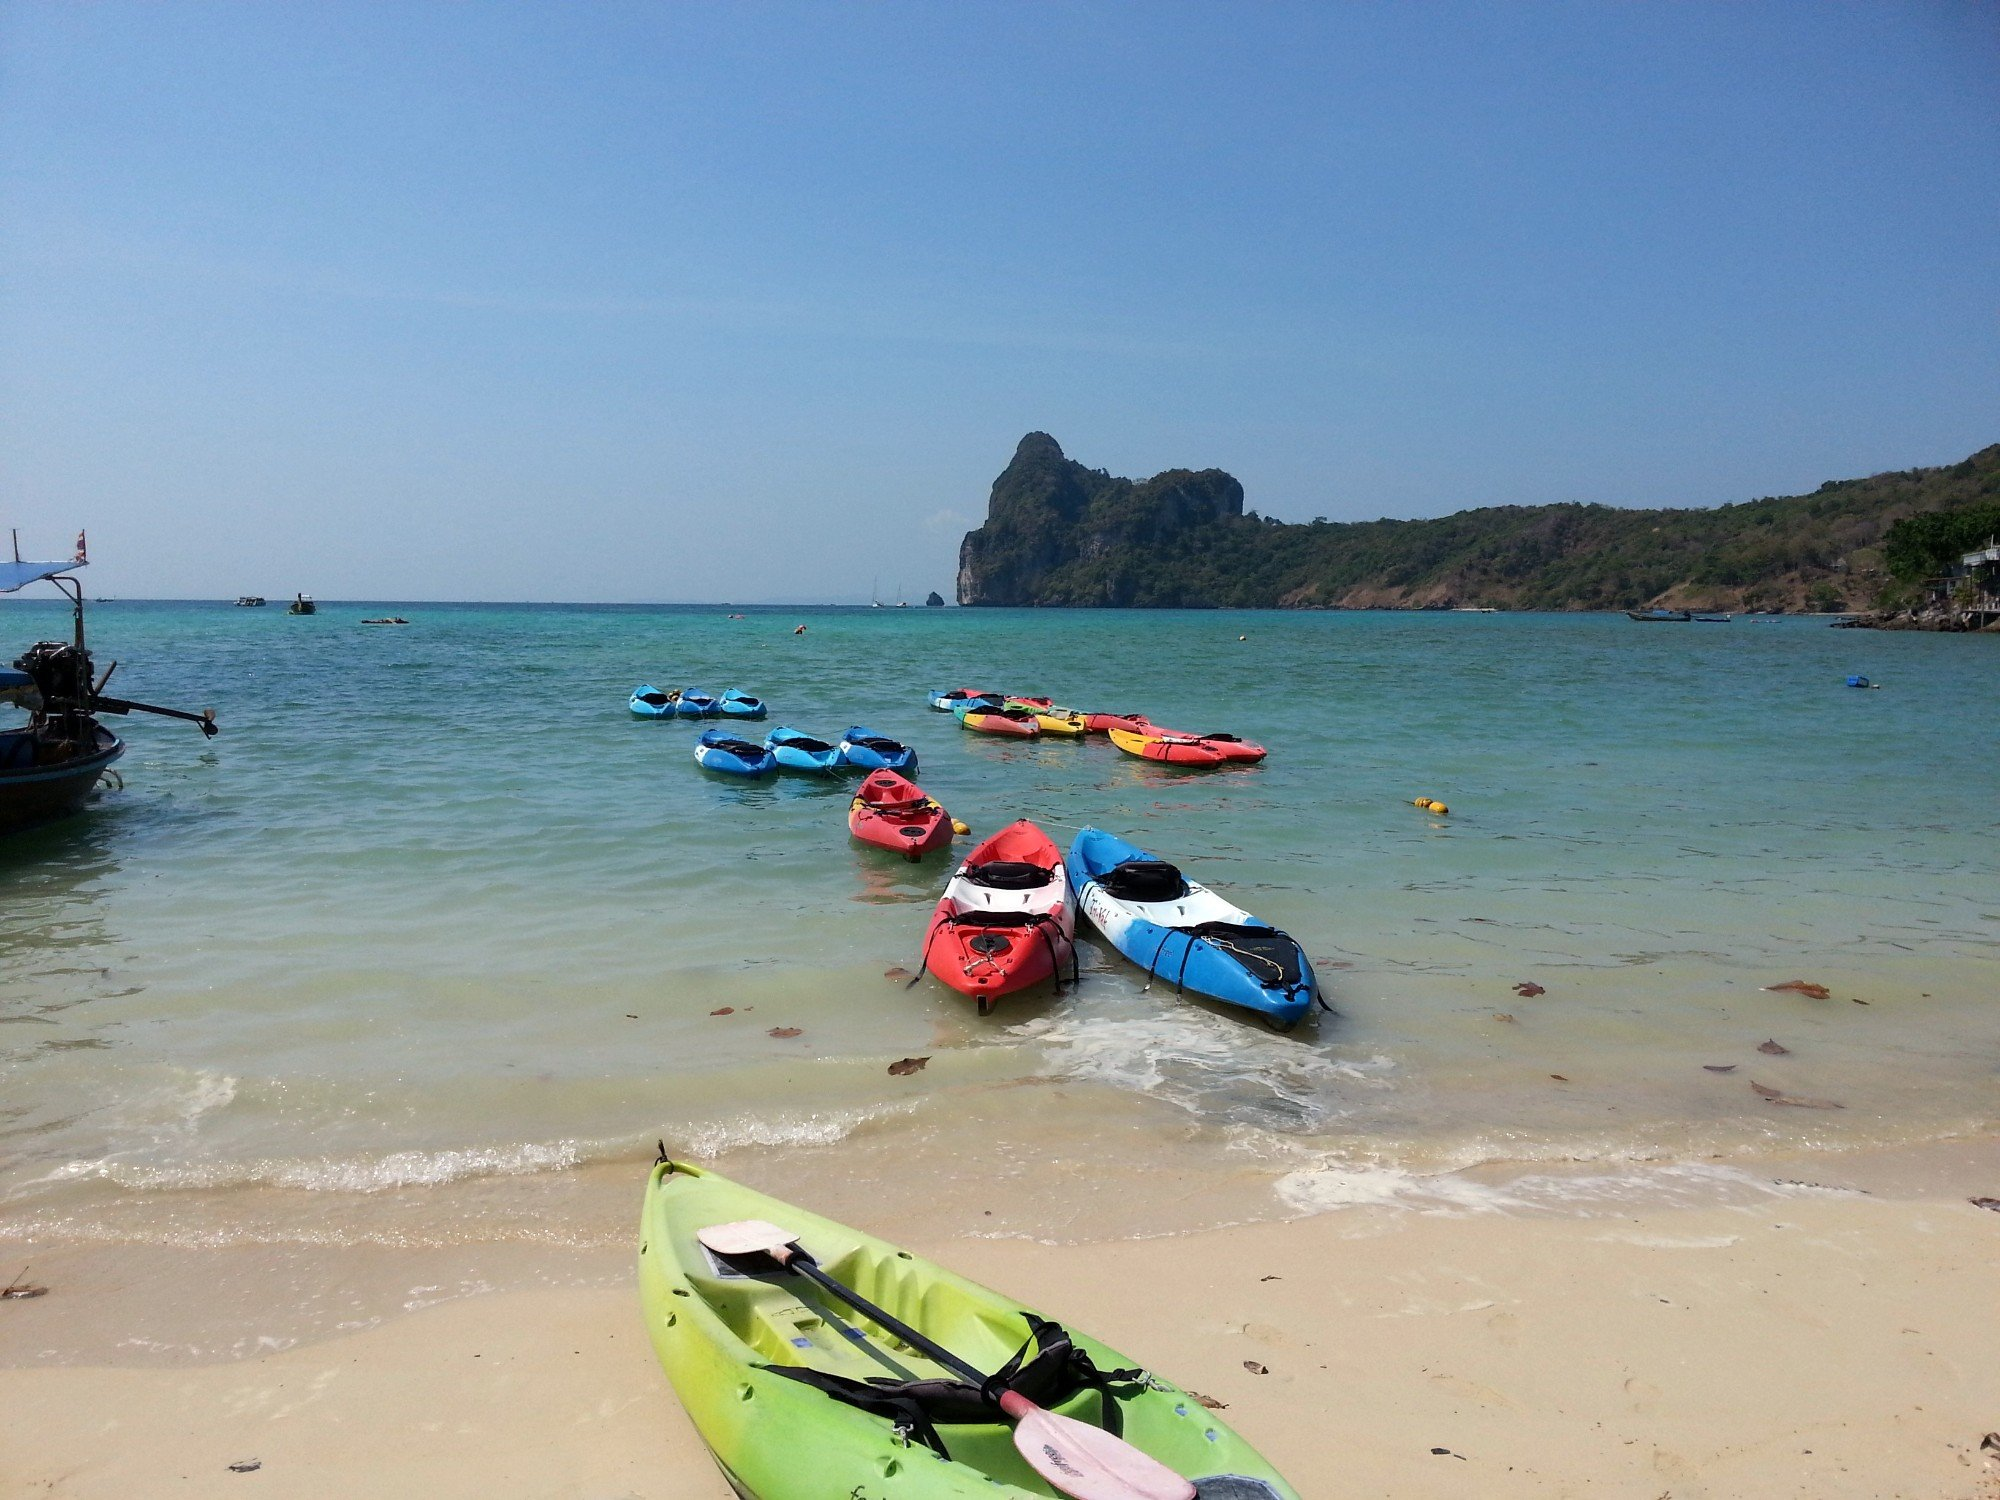 Kayaks on Loh Dalum Beach